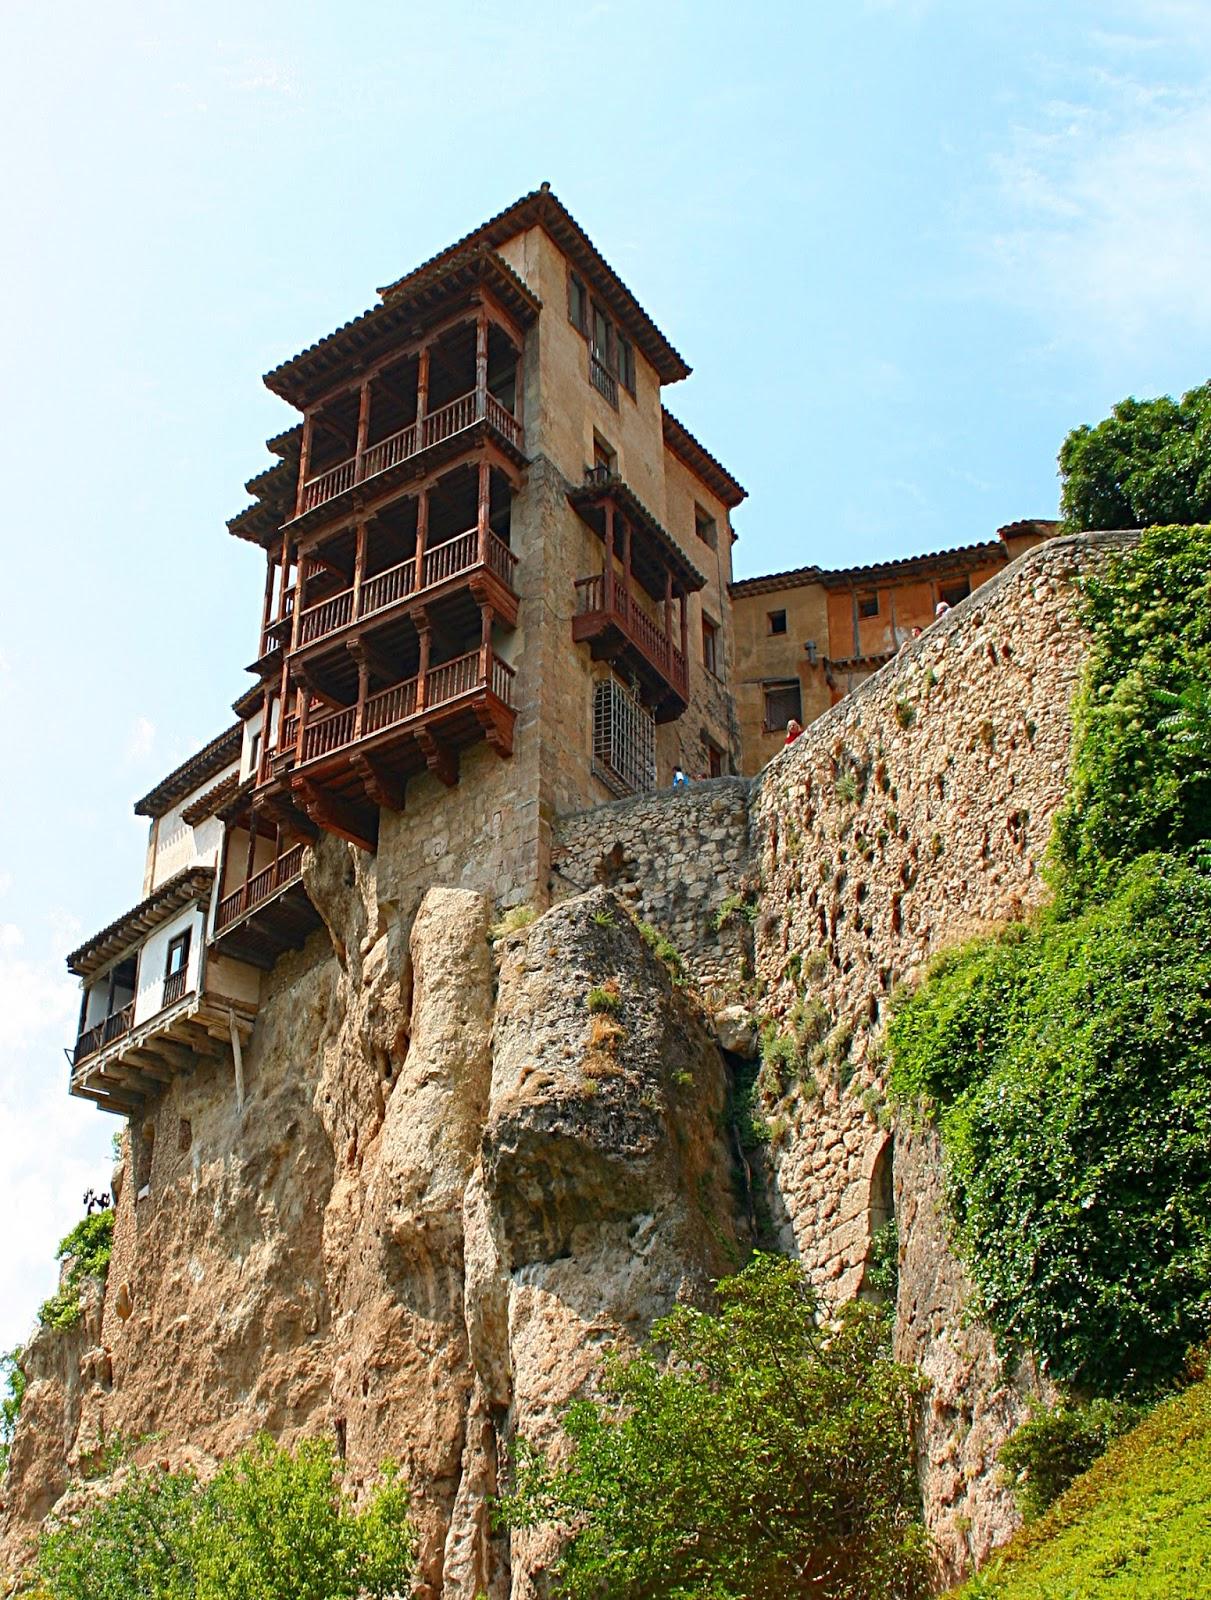 Pix grove hanging houses of cuenca spain - La casa de madera valencia ...